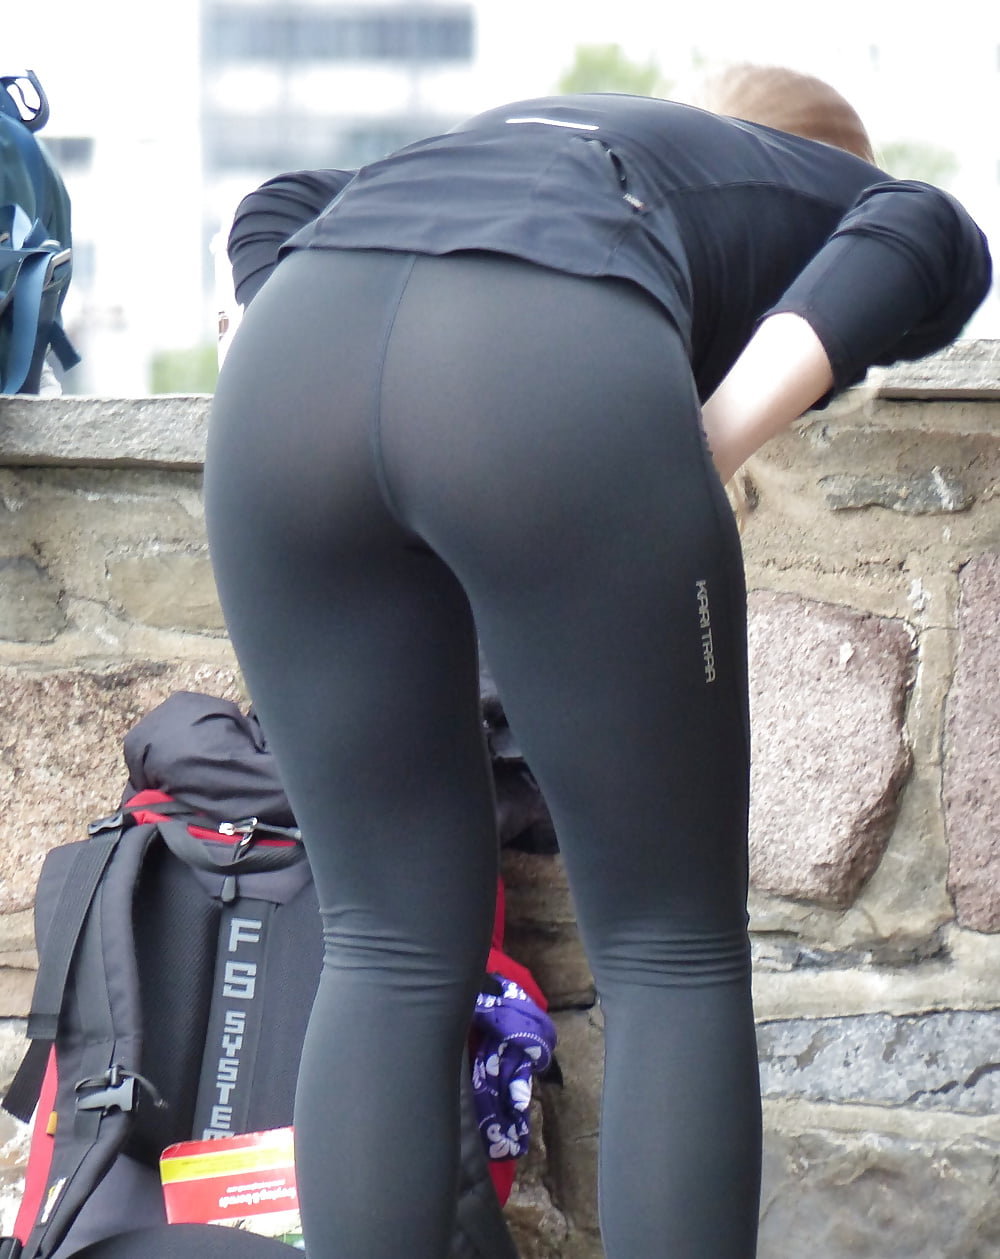 Spandex ass jogging video, sister pantie sex